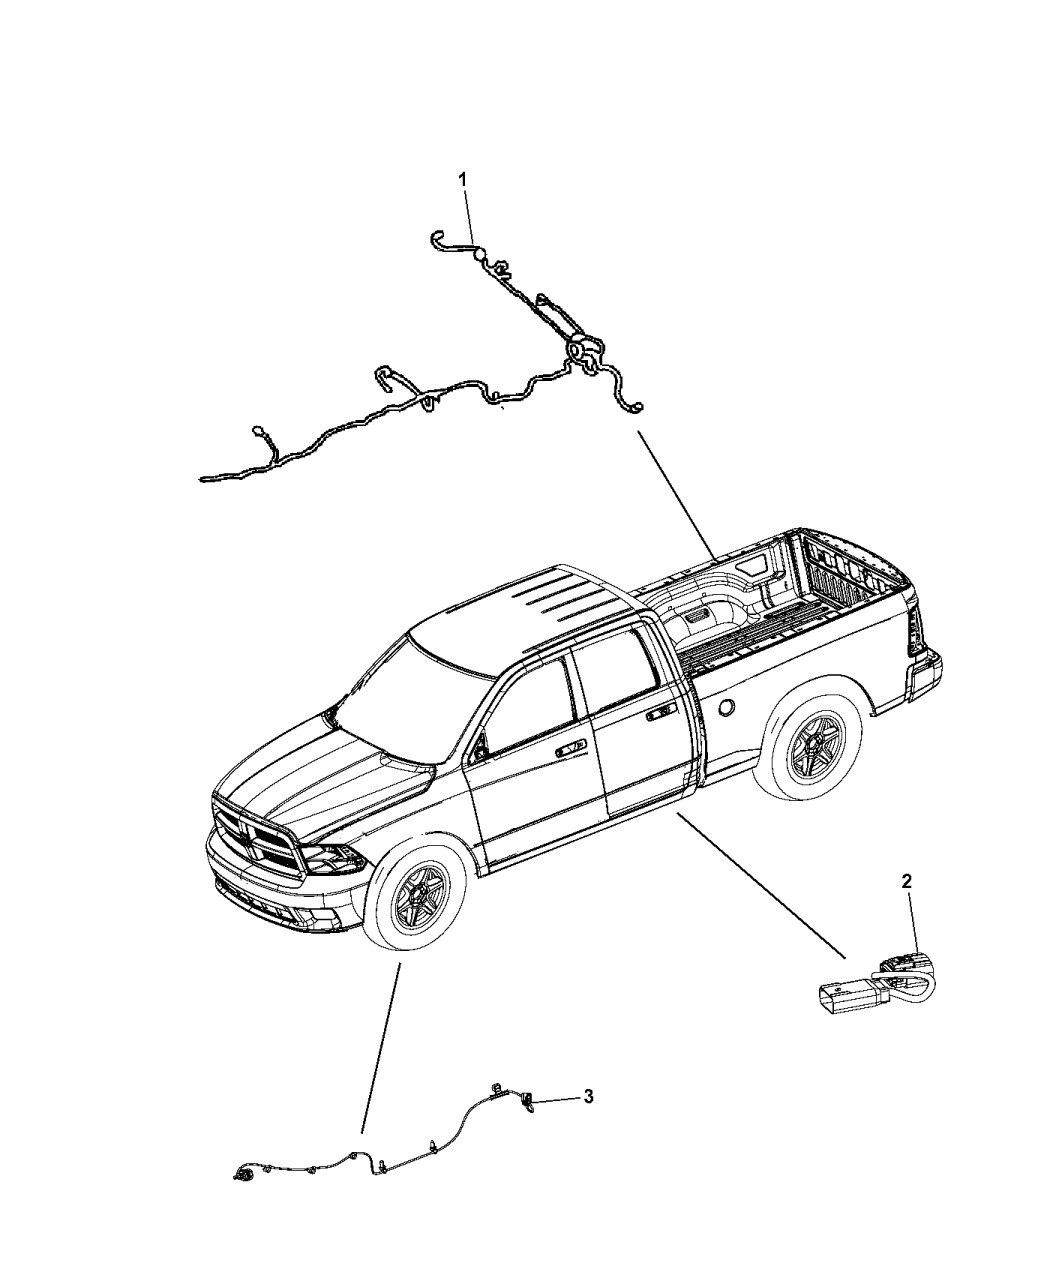 2015 Ram 5500 Wiring Chassis  U0026 Underbody